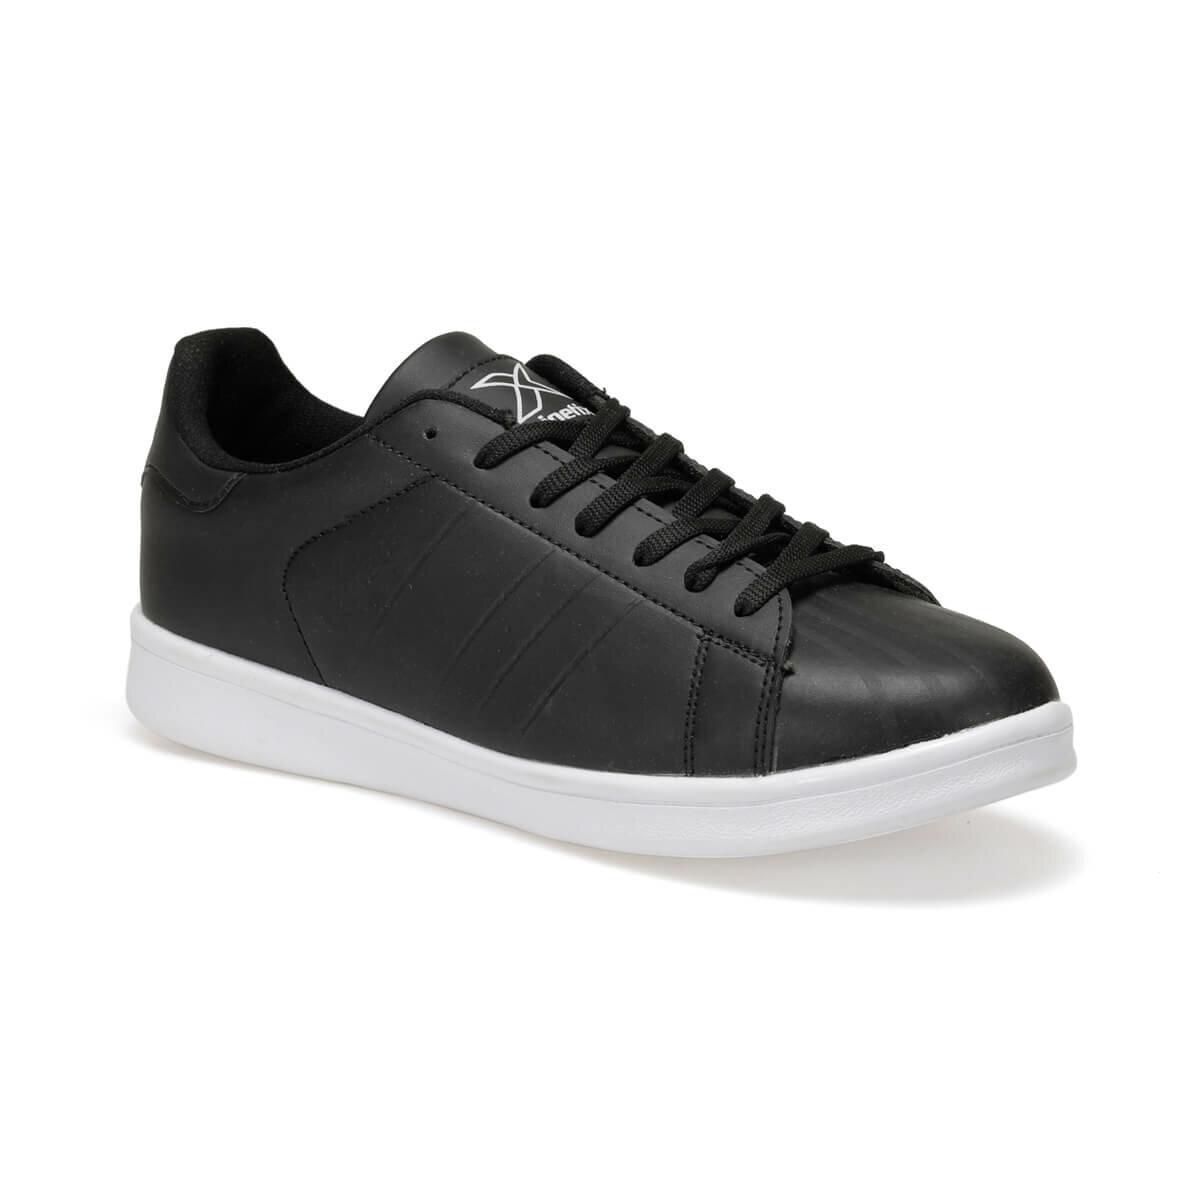 FLO ADRAN M Black Men 'S Sneaker Shoes KINETIX